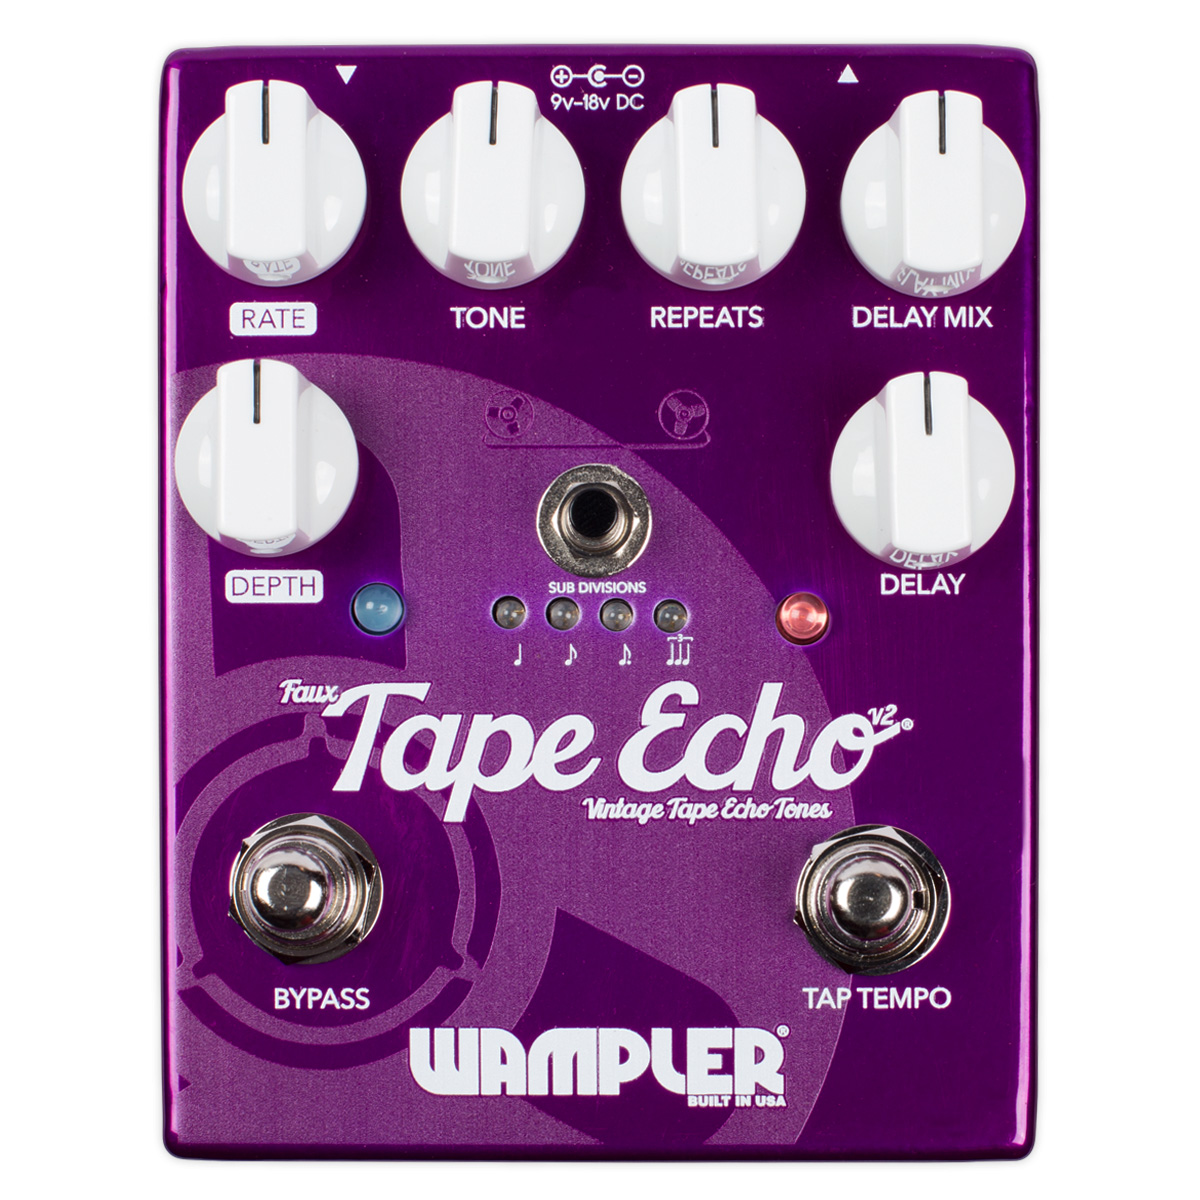 Wampler Pedals Faux Tape Echo v2 新品 [ワンプラー][テープエコー][Effector,エフェクター]